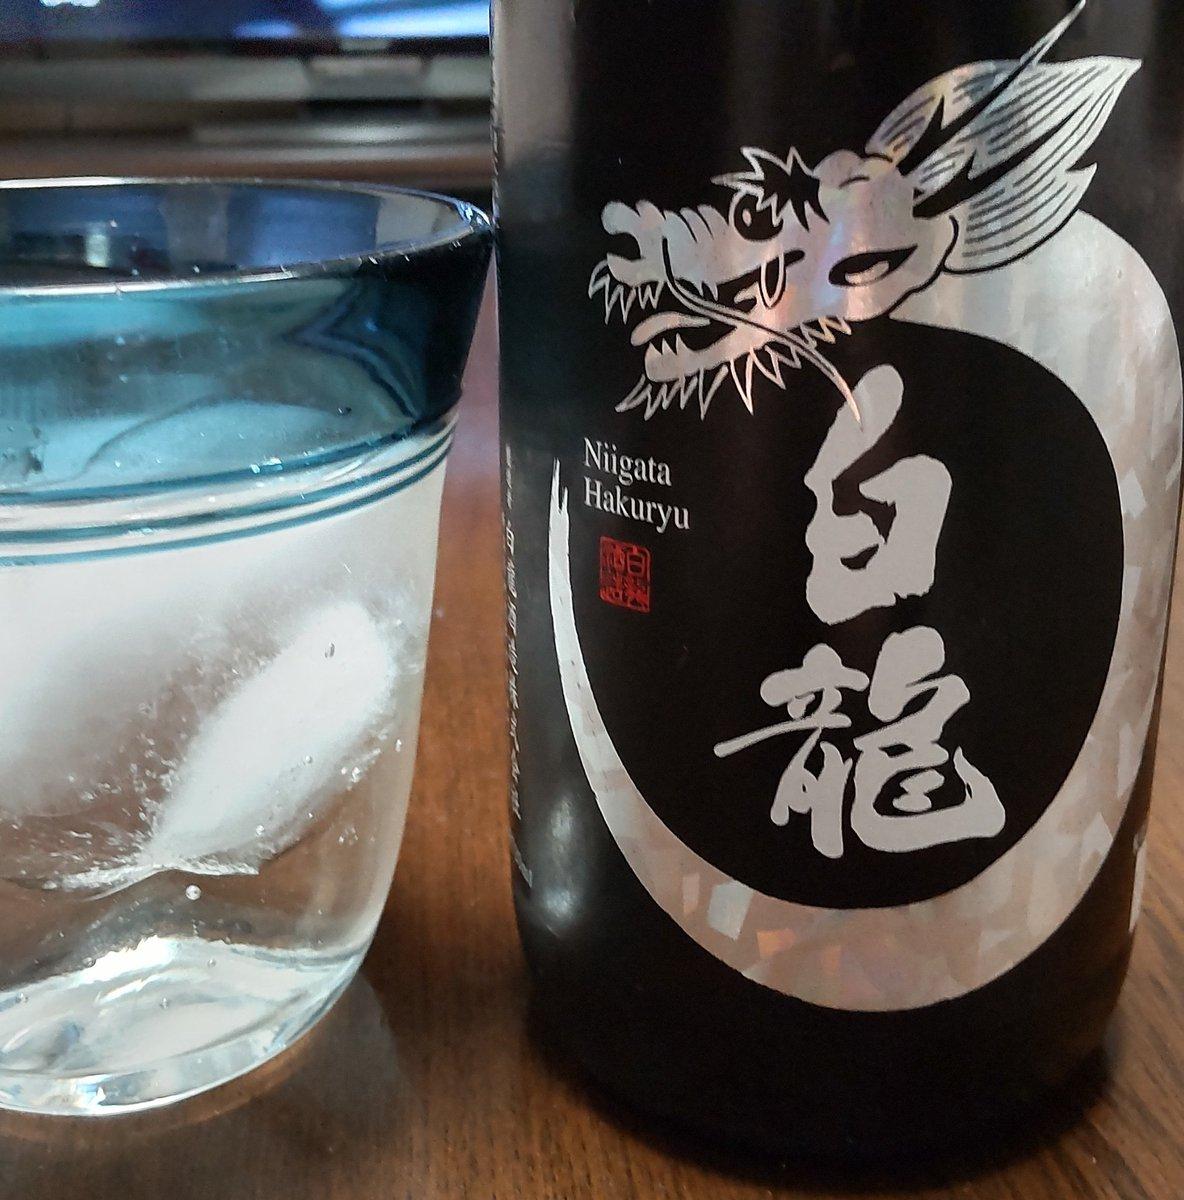 test ツイッターメディア - ついにオフィス内にコロナ感染者出ました😏フロア内の全く違う部署ですが自粛と営業停止とリモートと健康観察かと思いきや…普通に出社です(笑) いつもと同じで日本酒🍶を接種いたしまぁす✨  #白龍 純米吟醸原酒白龍 https://t.co/wrnbwL2oJm